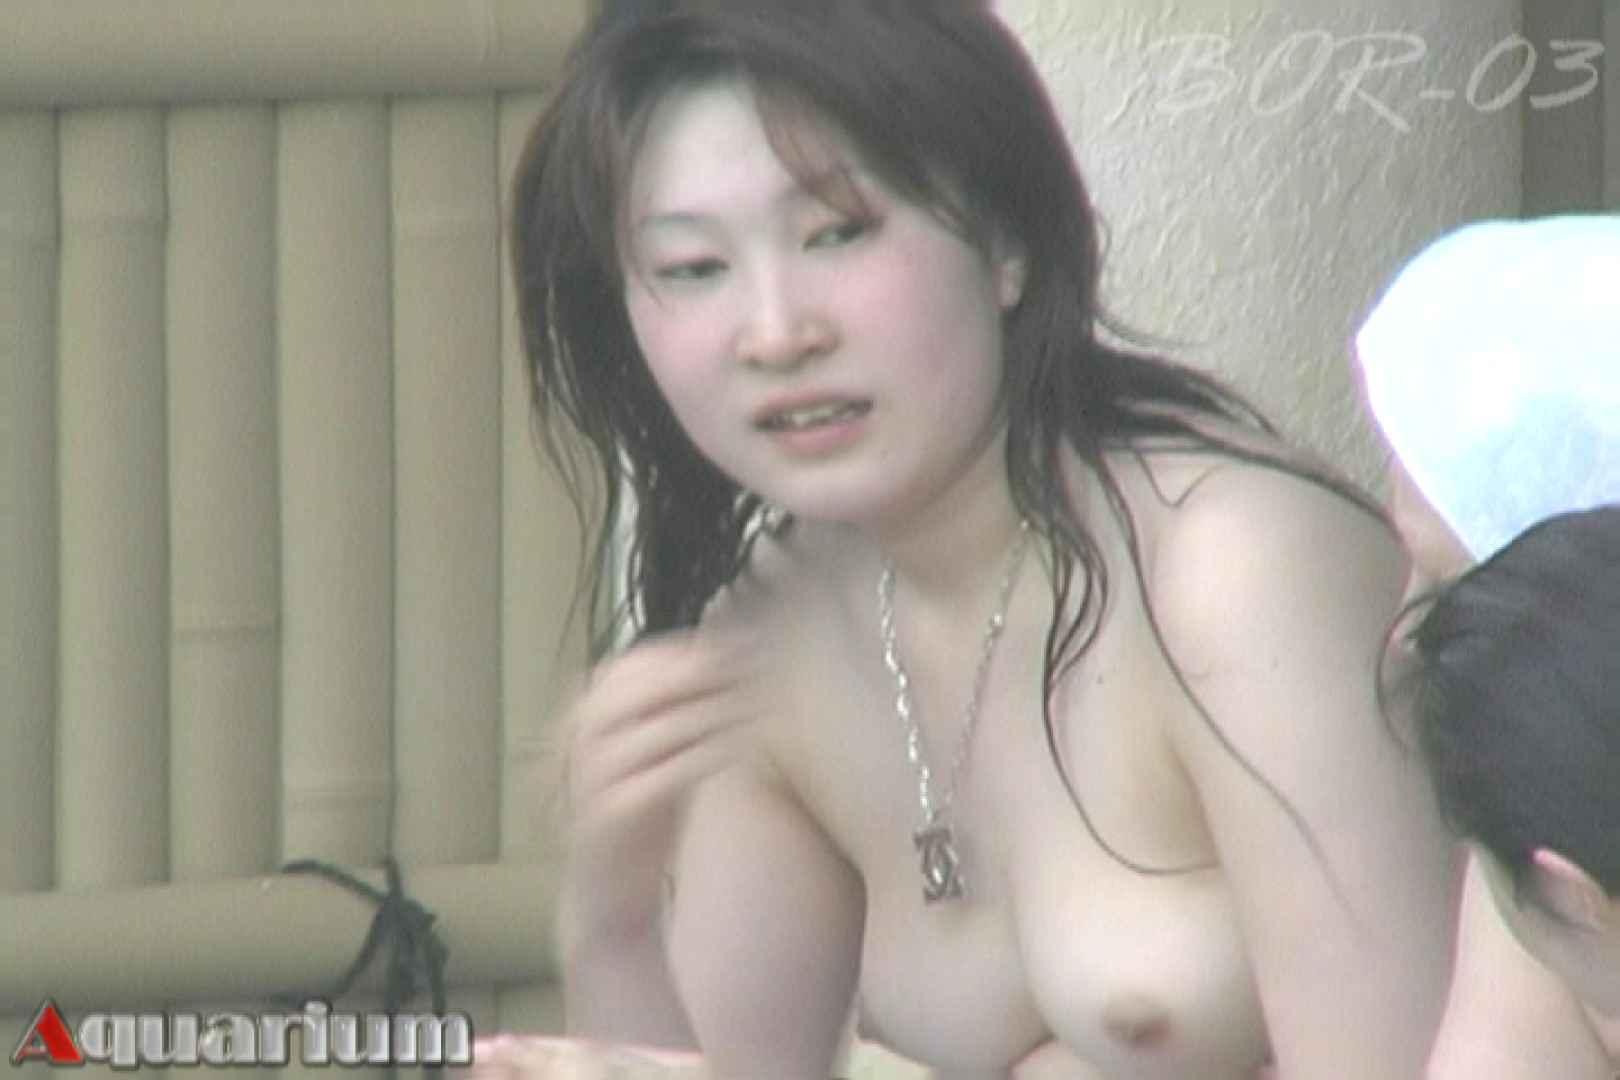 Aquaな露天風呂Vol.486 盗撮 | OLセックス  85画像 85